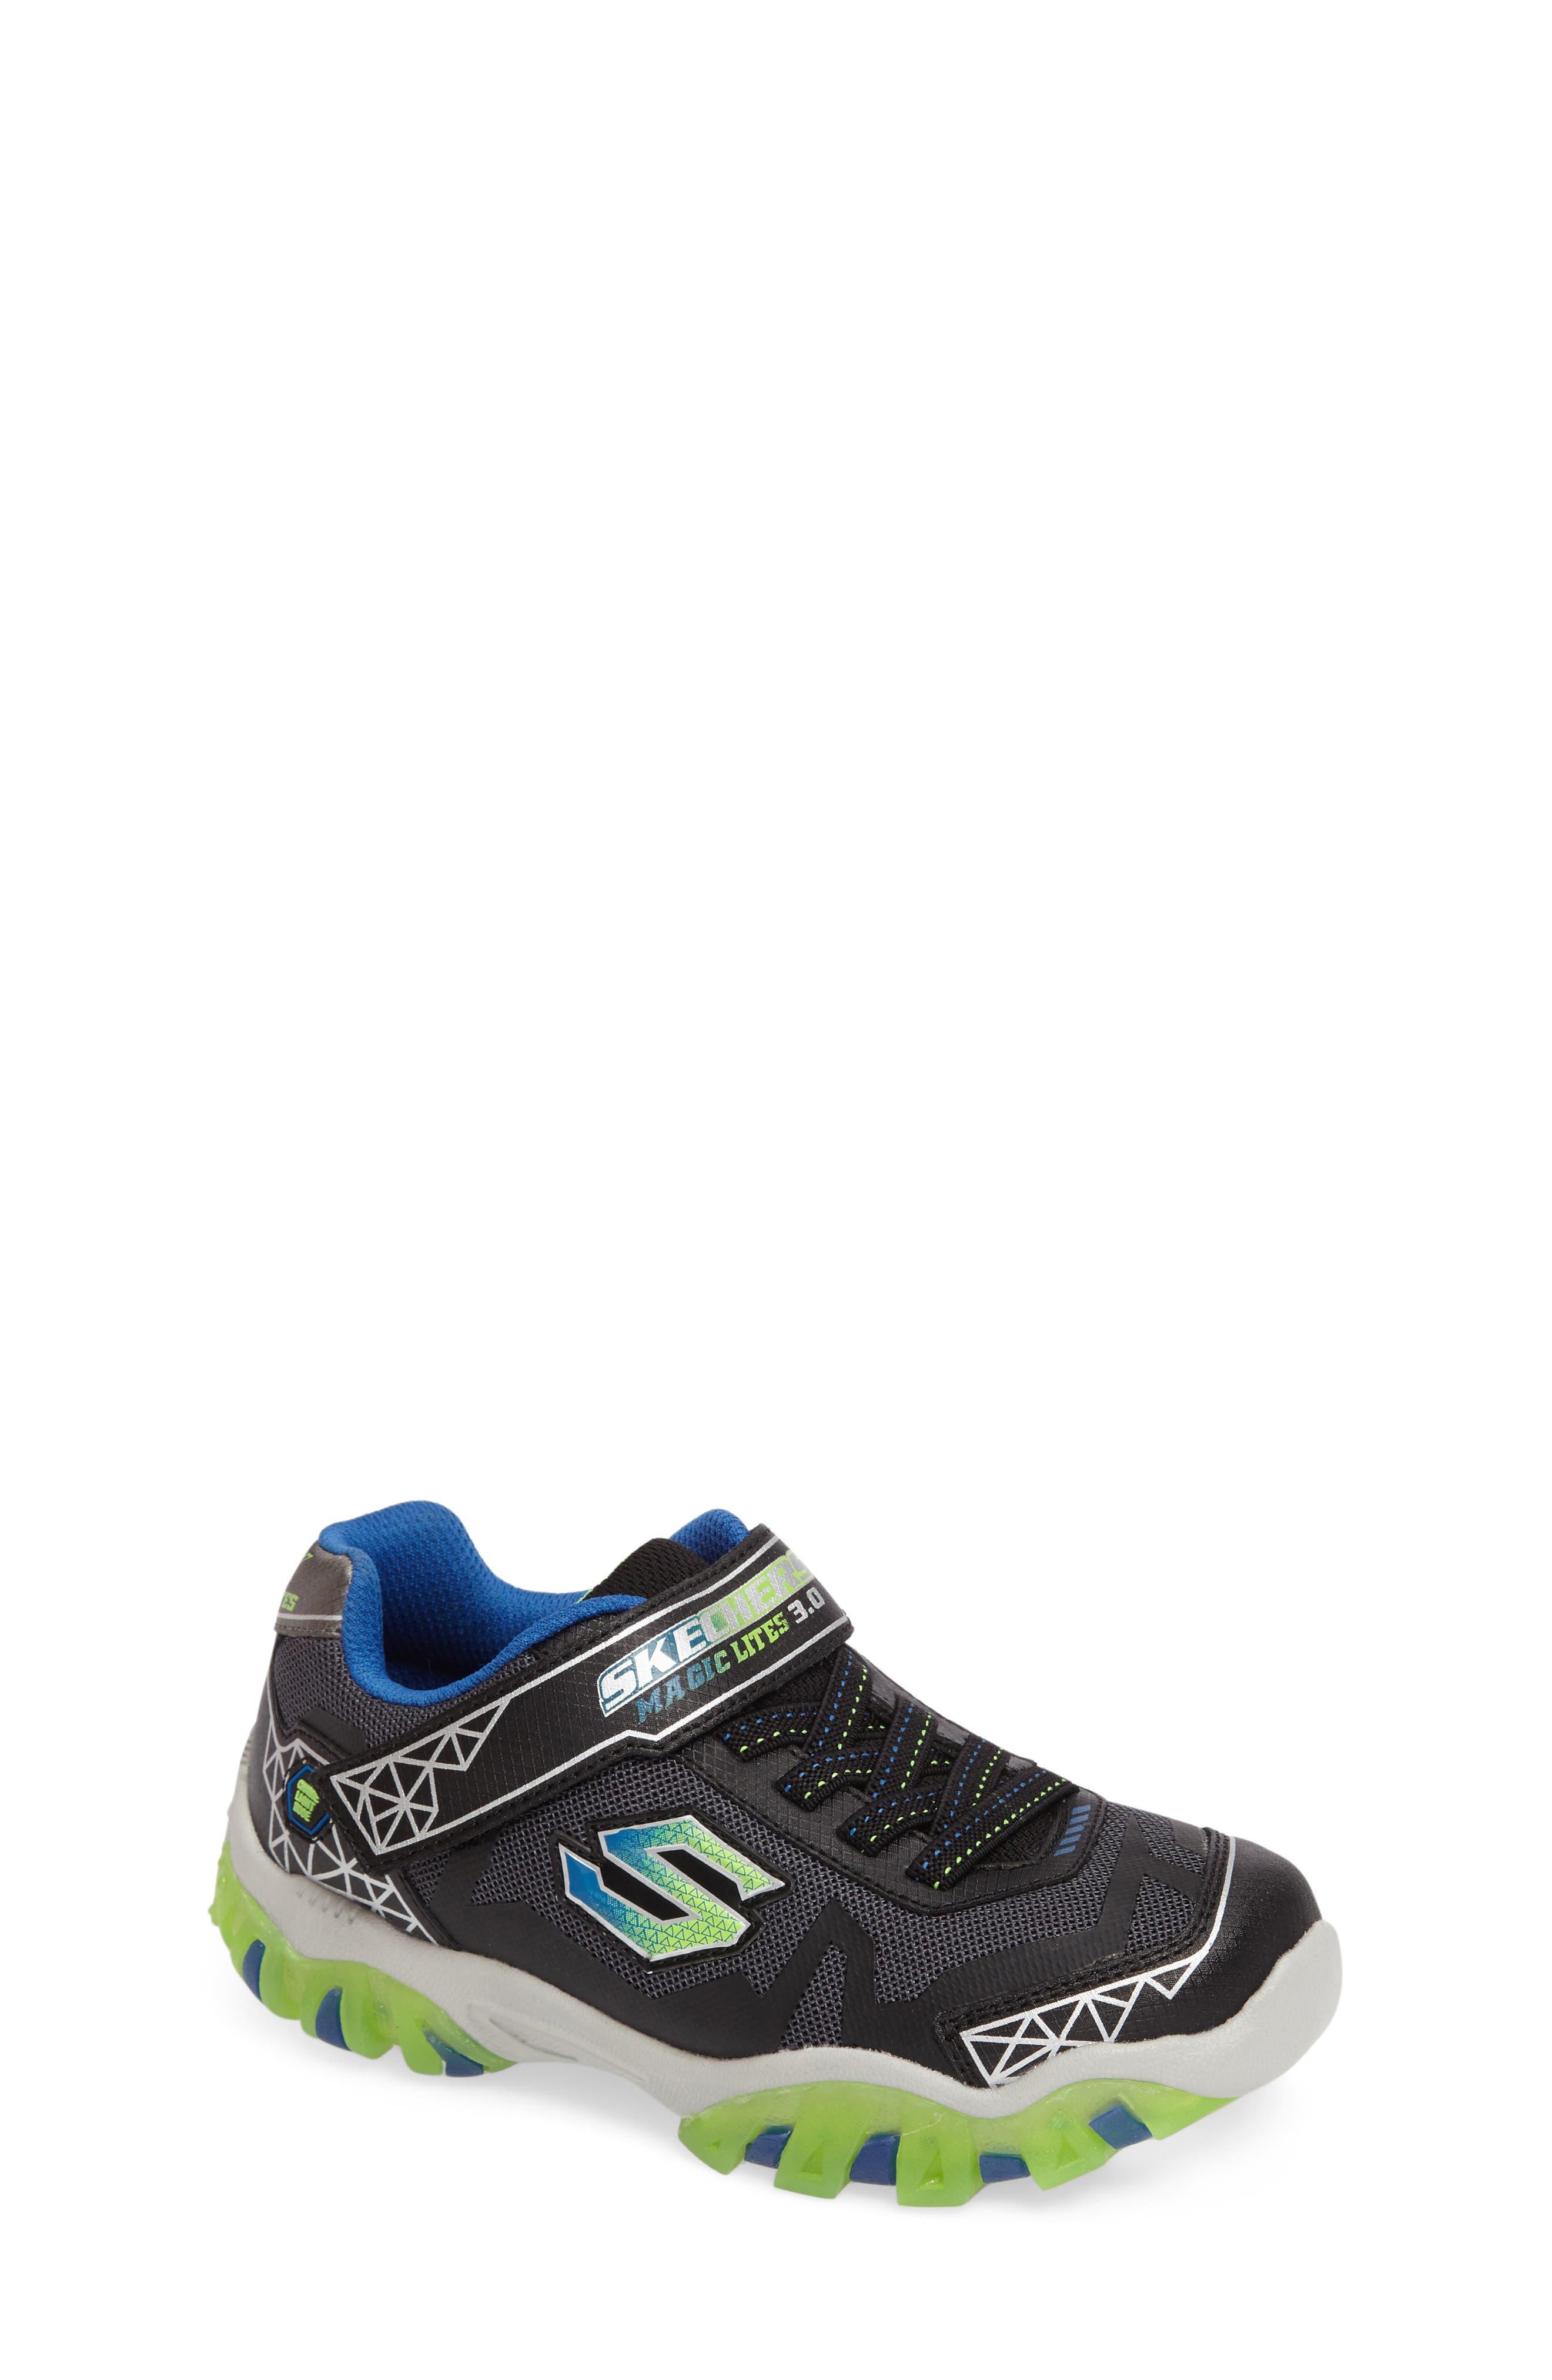 Magic Lites - Street Lightz 2.0 Light-Up Sneaker,                             Main thumbnail 1, color,                             Black/ Green